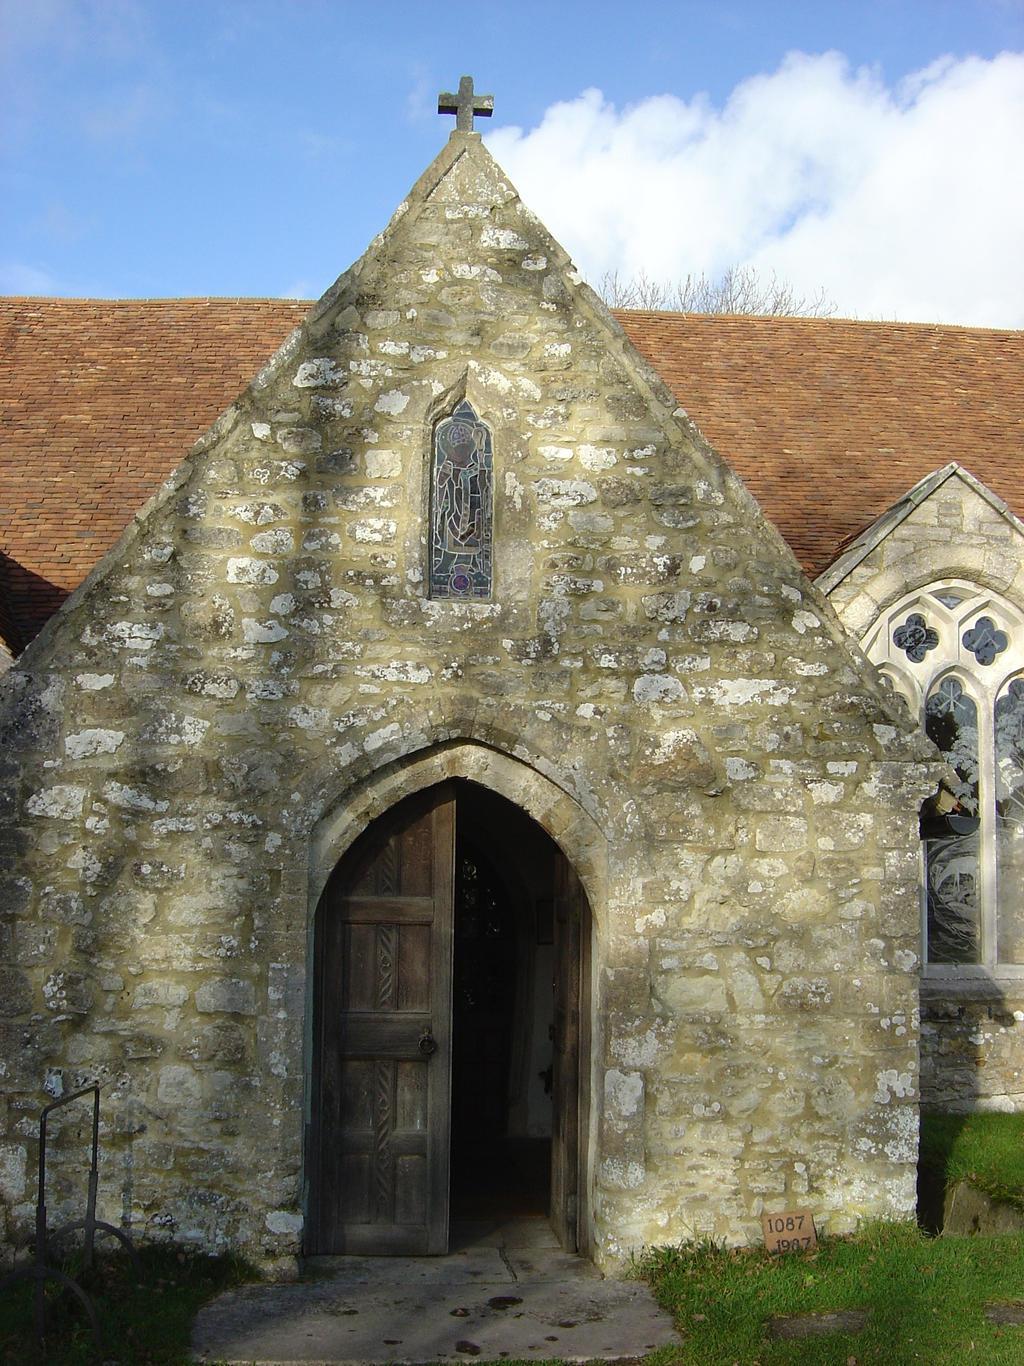 DSC00272 South entrance to Church of St. John  by VIRGOLINEDANCER1